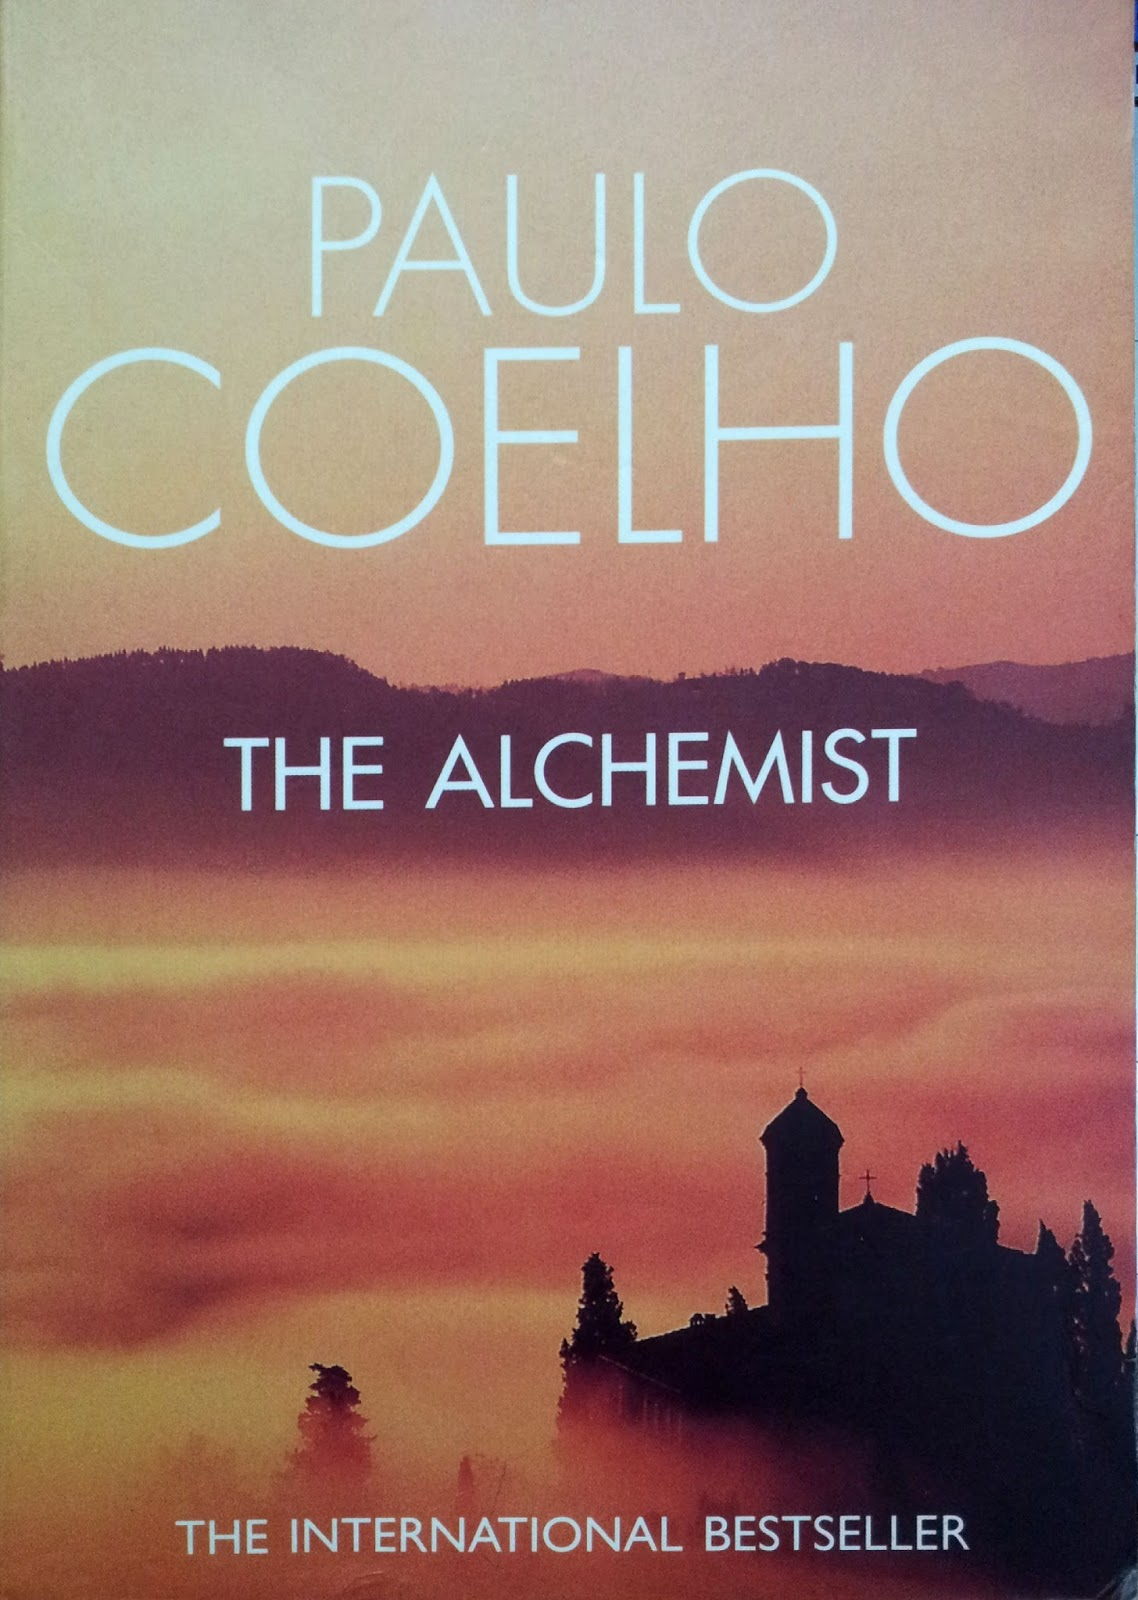 paulo coelho quotes author of the alchemist goodreads - HD1138×1600